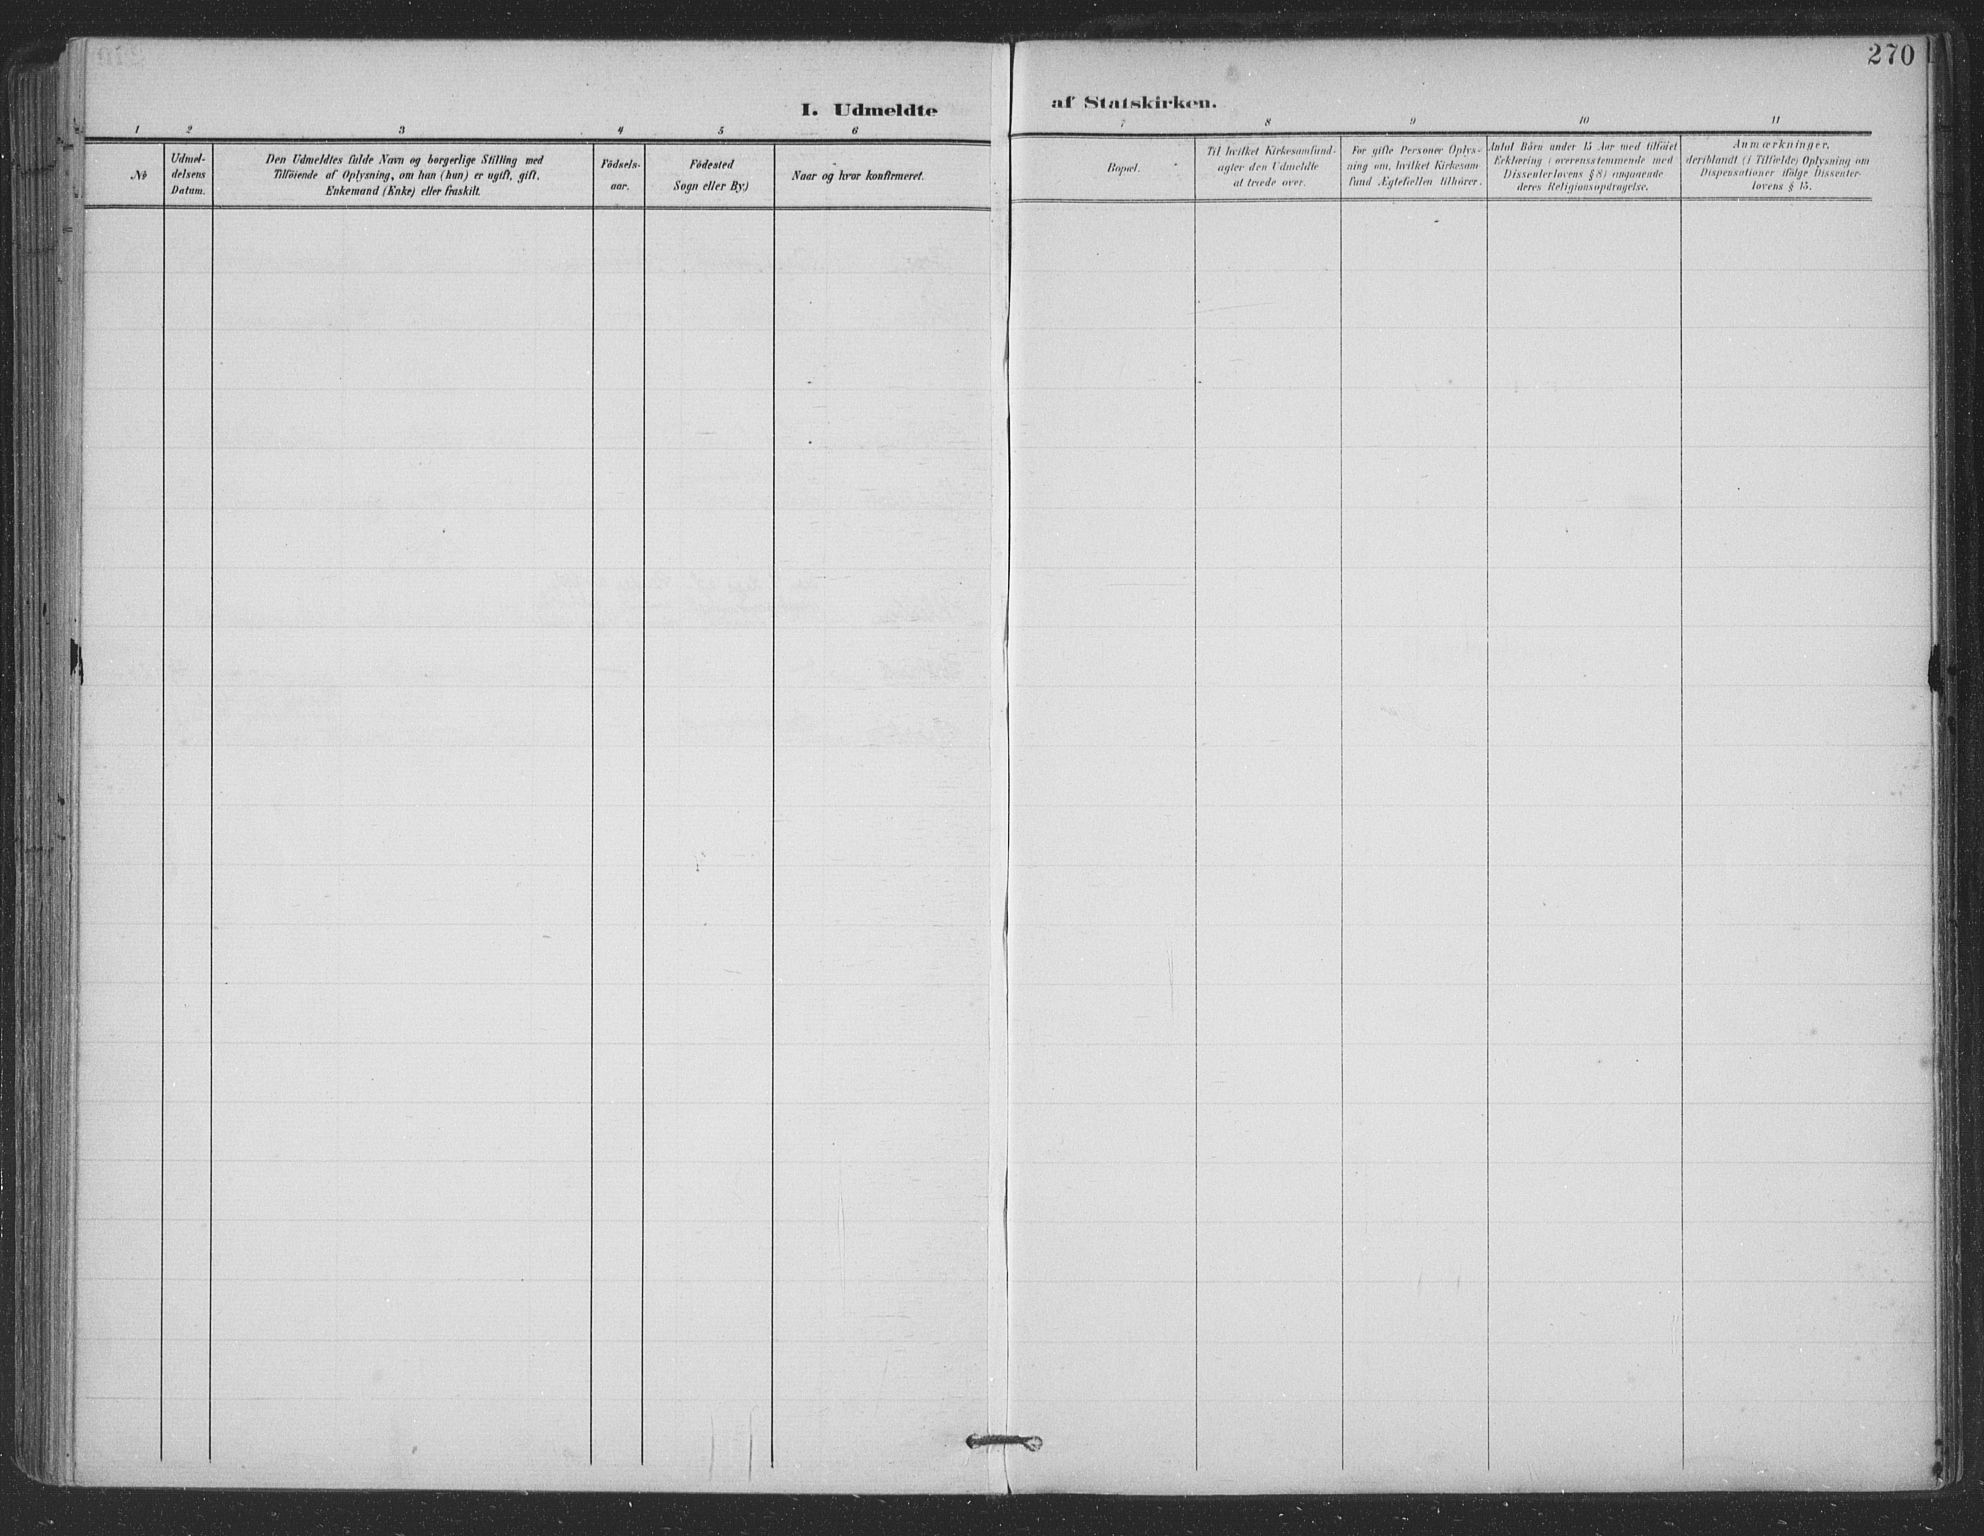 SAT, Ministerialprotokoller, klokkerbøker og fødselsregistre - Nordland, 863/L0899: Ministerialbok nr. 863A11, 1897-1906, s. 270